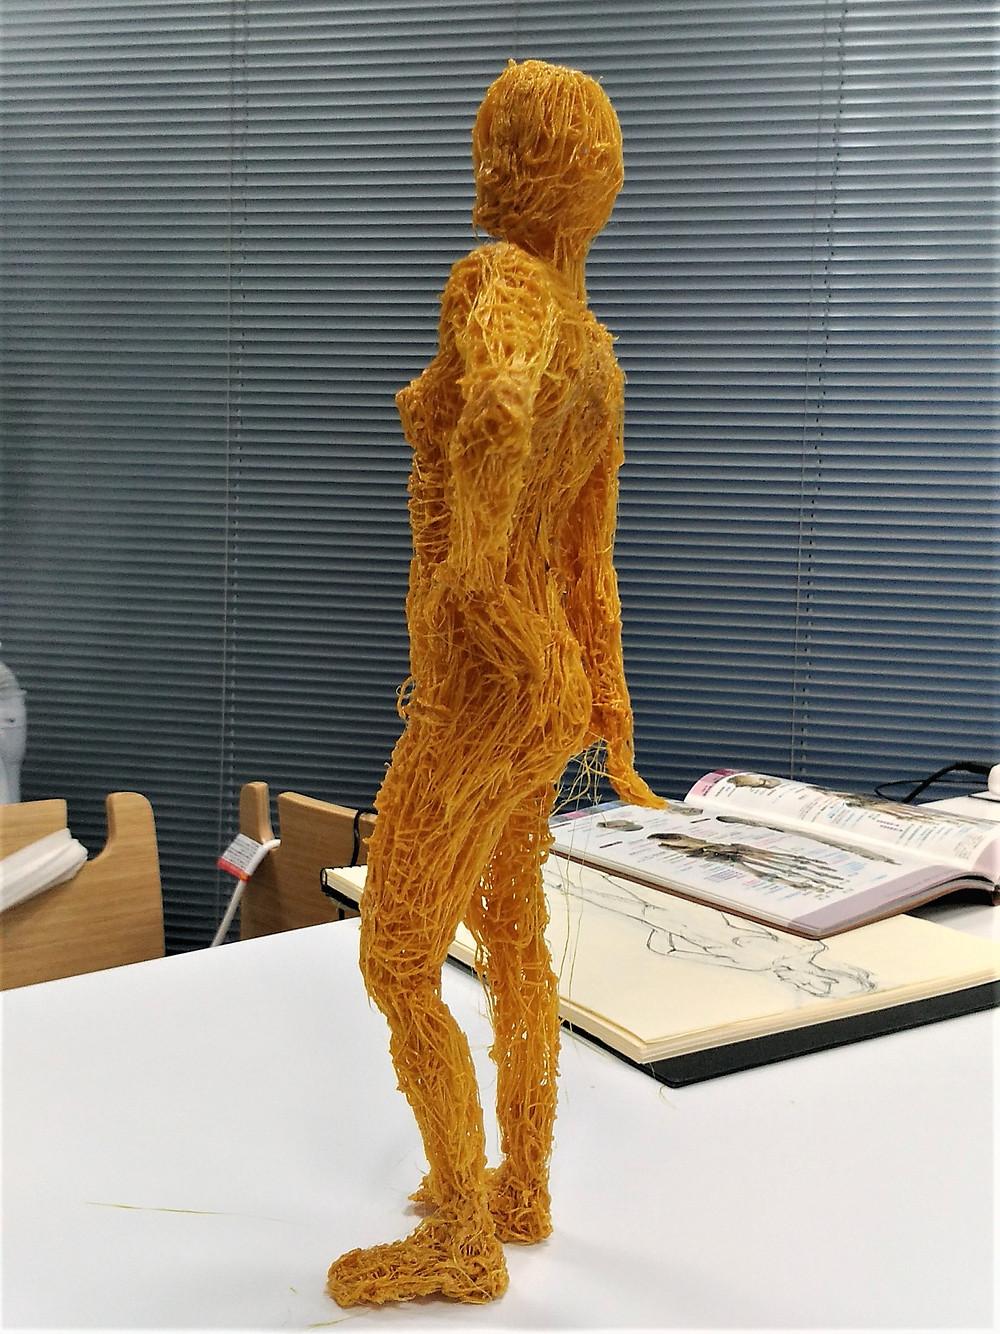 3Dペンモデリング初挑戦の方の途中作品